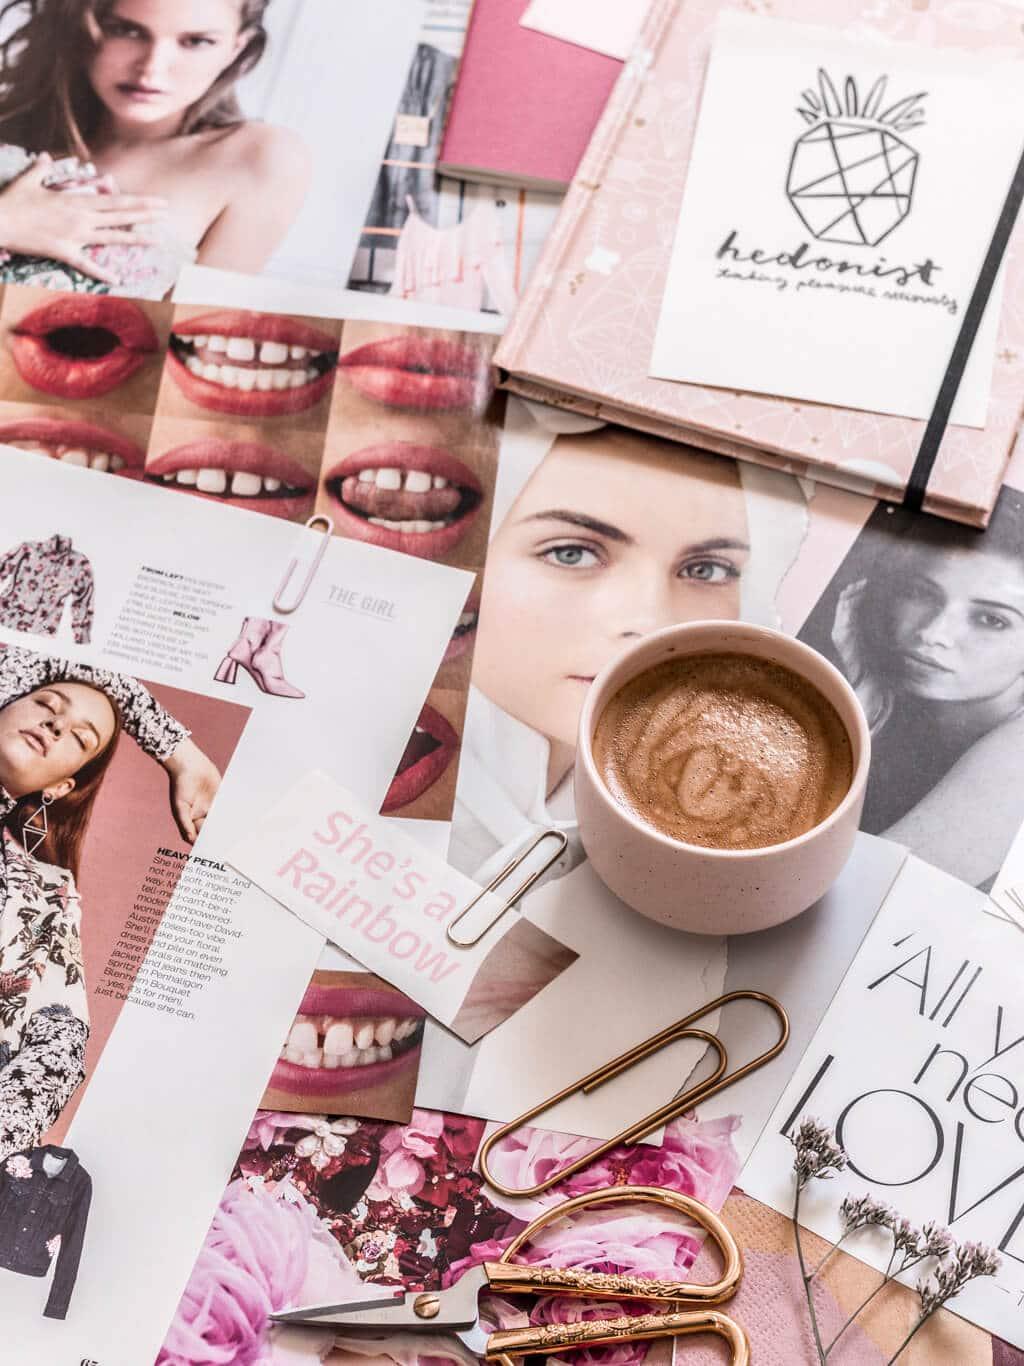 blogging tips and tricks | טיפים לבלוגרים